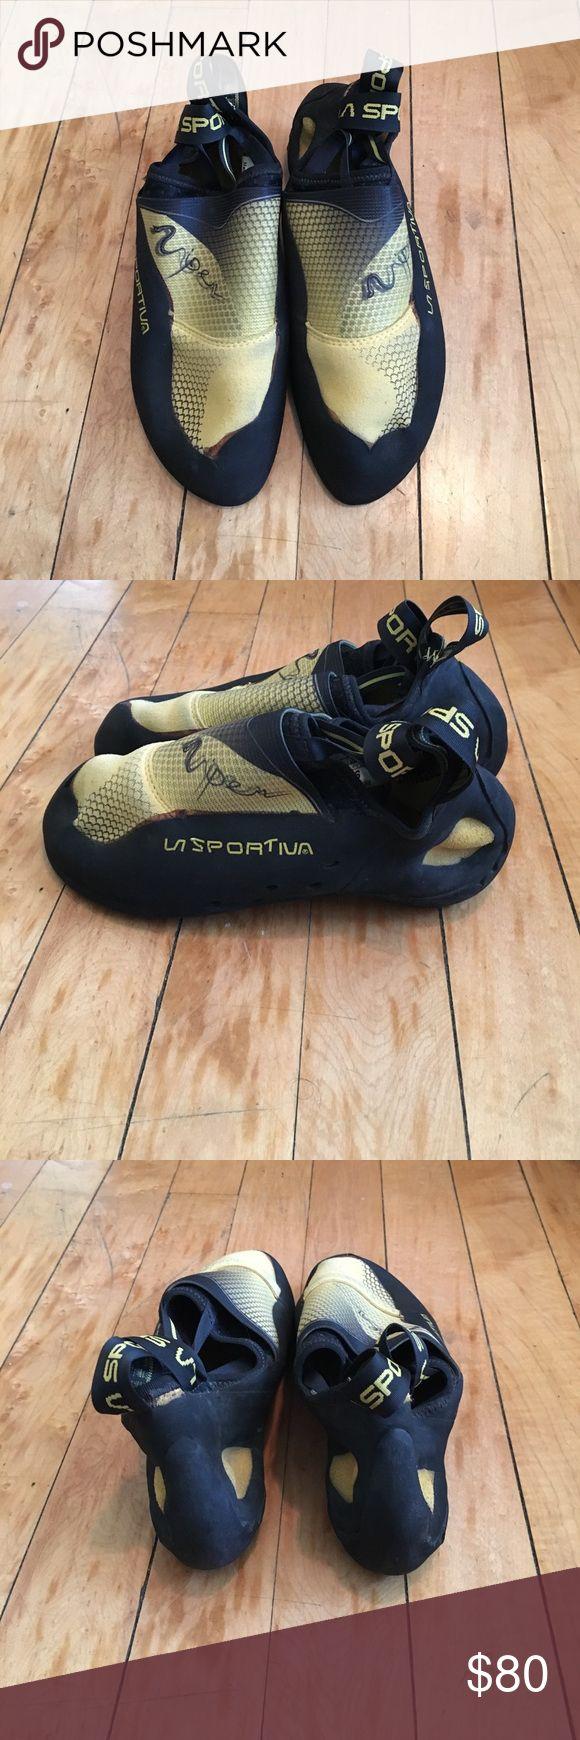 Selling this La Sportiva Viper Climbing Shoes on Poshmark! My username is: 2ndhandsummit. #shopmycloset #poshmark #fashion #shopping #style #forsale #la sportiva #Shoes